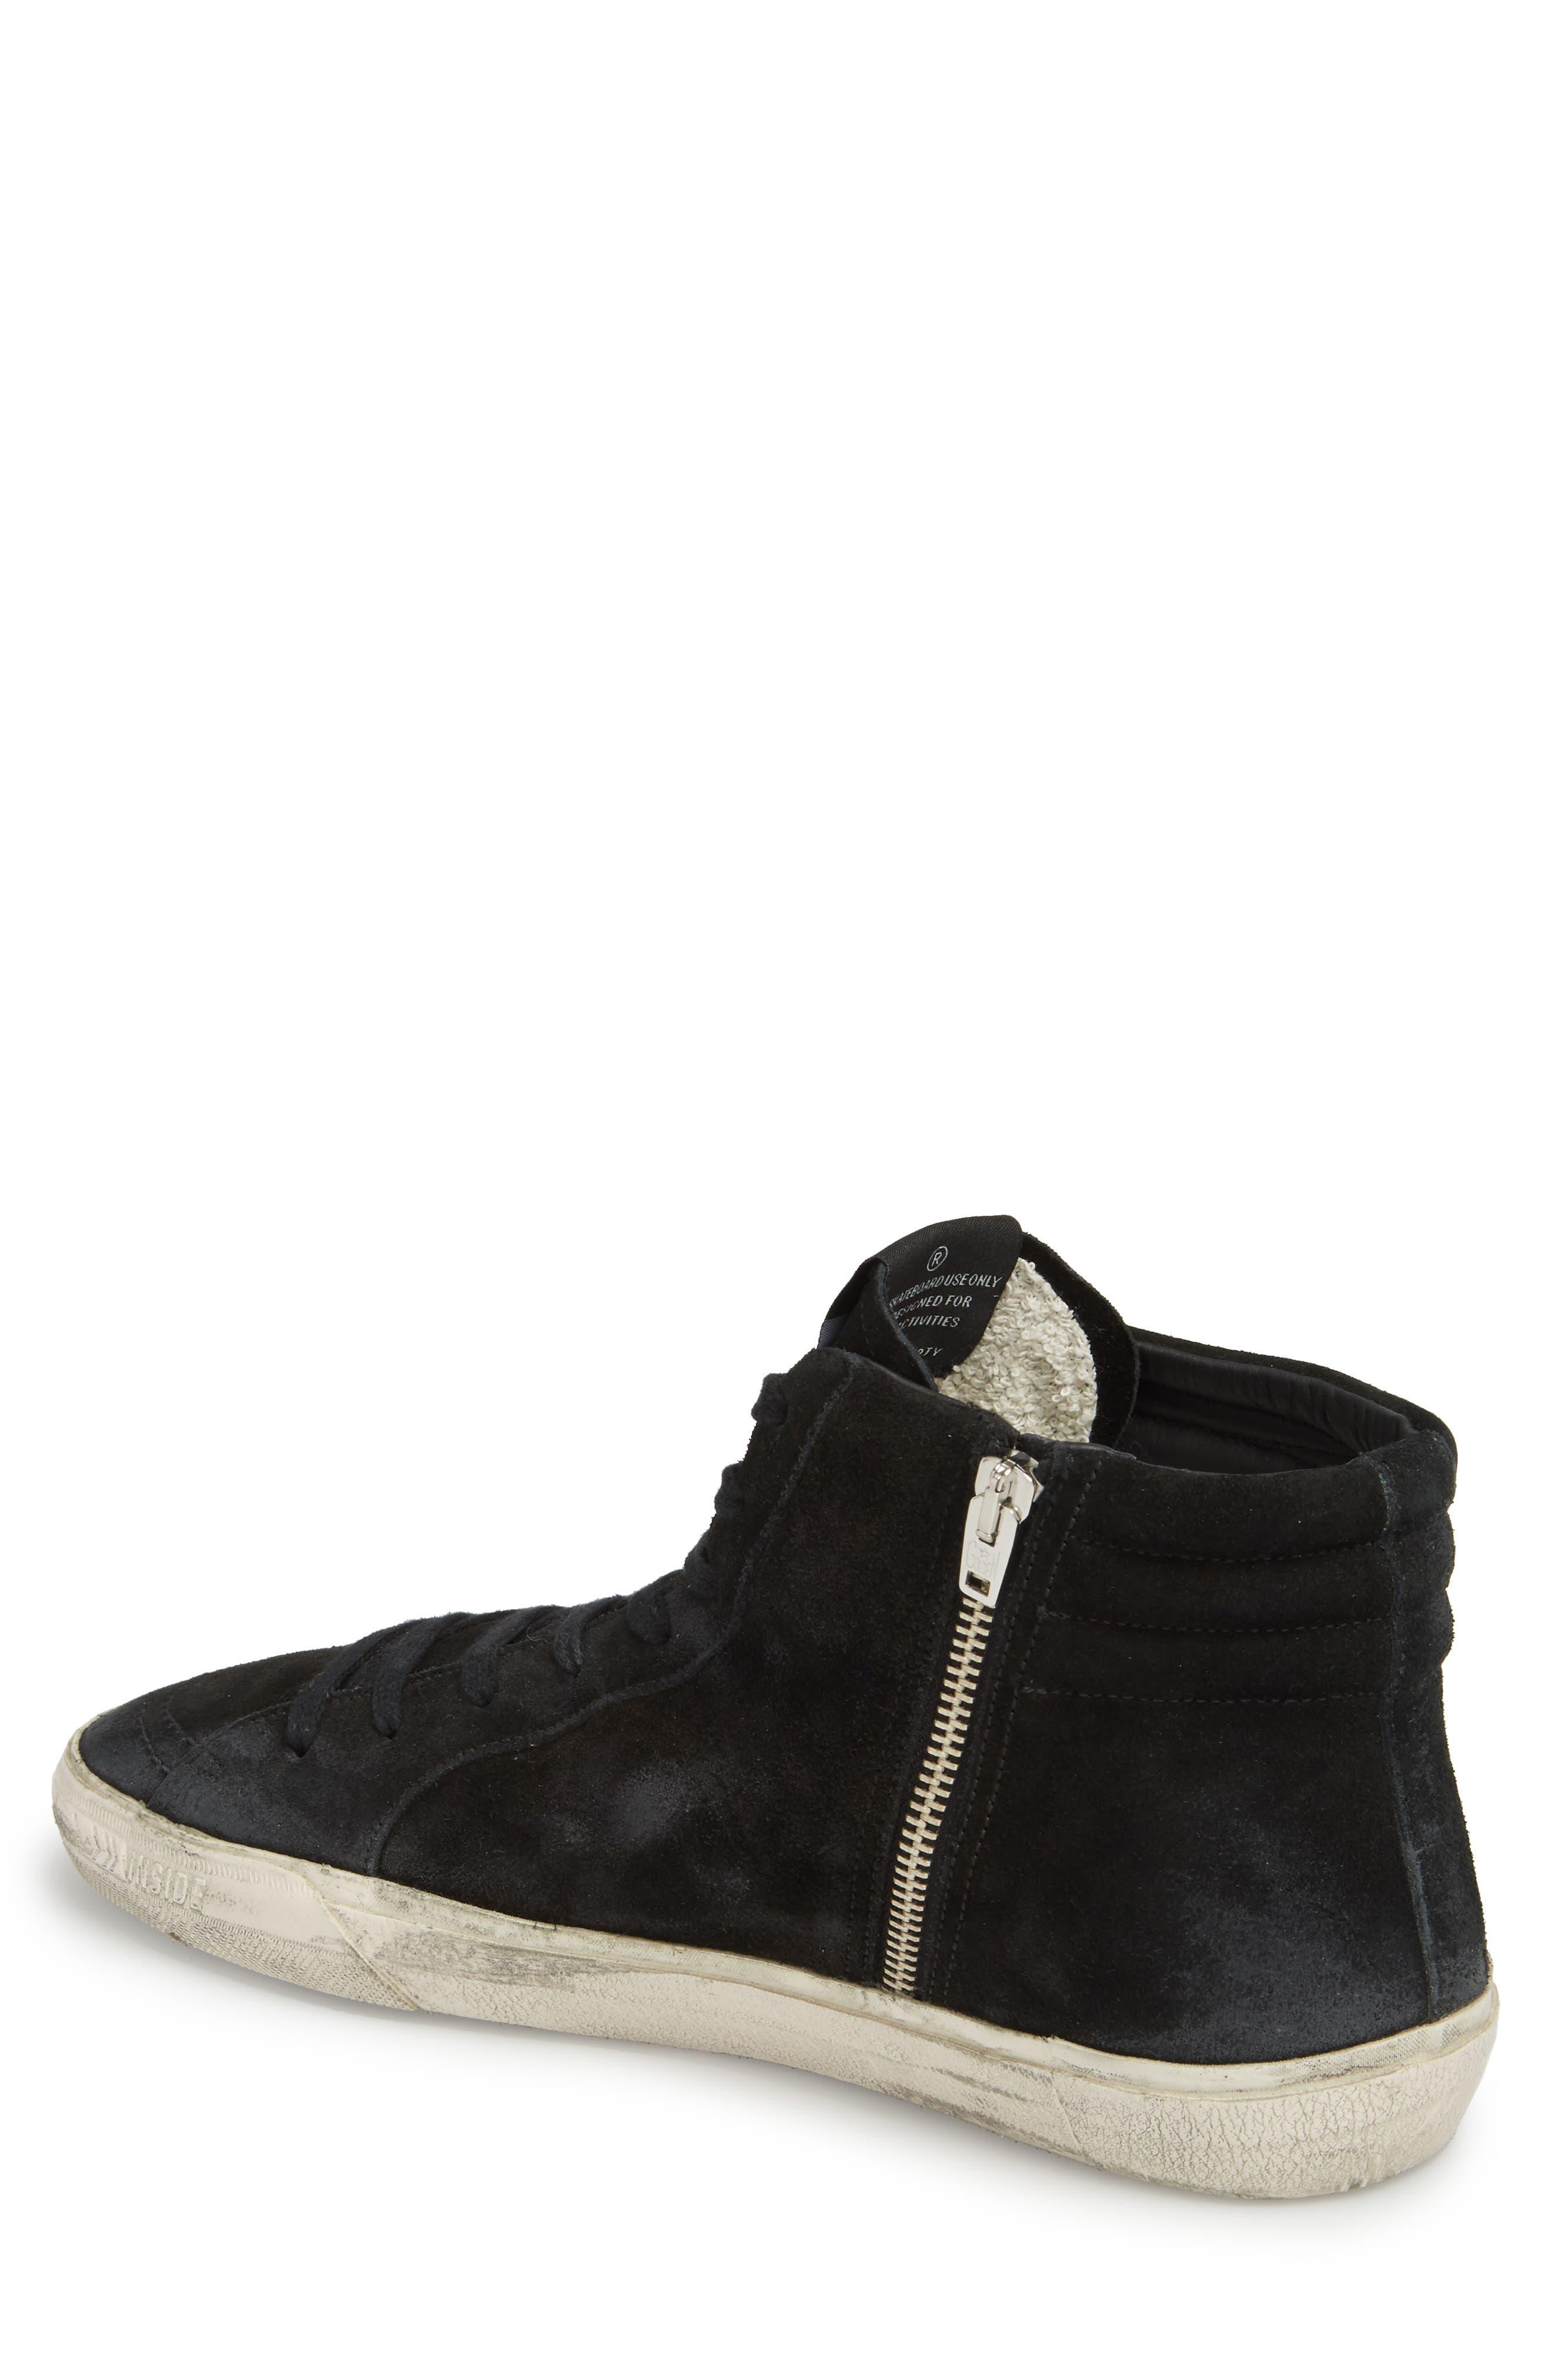 'Slide' Sneaker,                             Alternate thumbnail 2, color,                             BLACK SUEDE